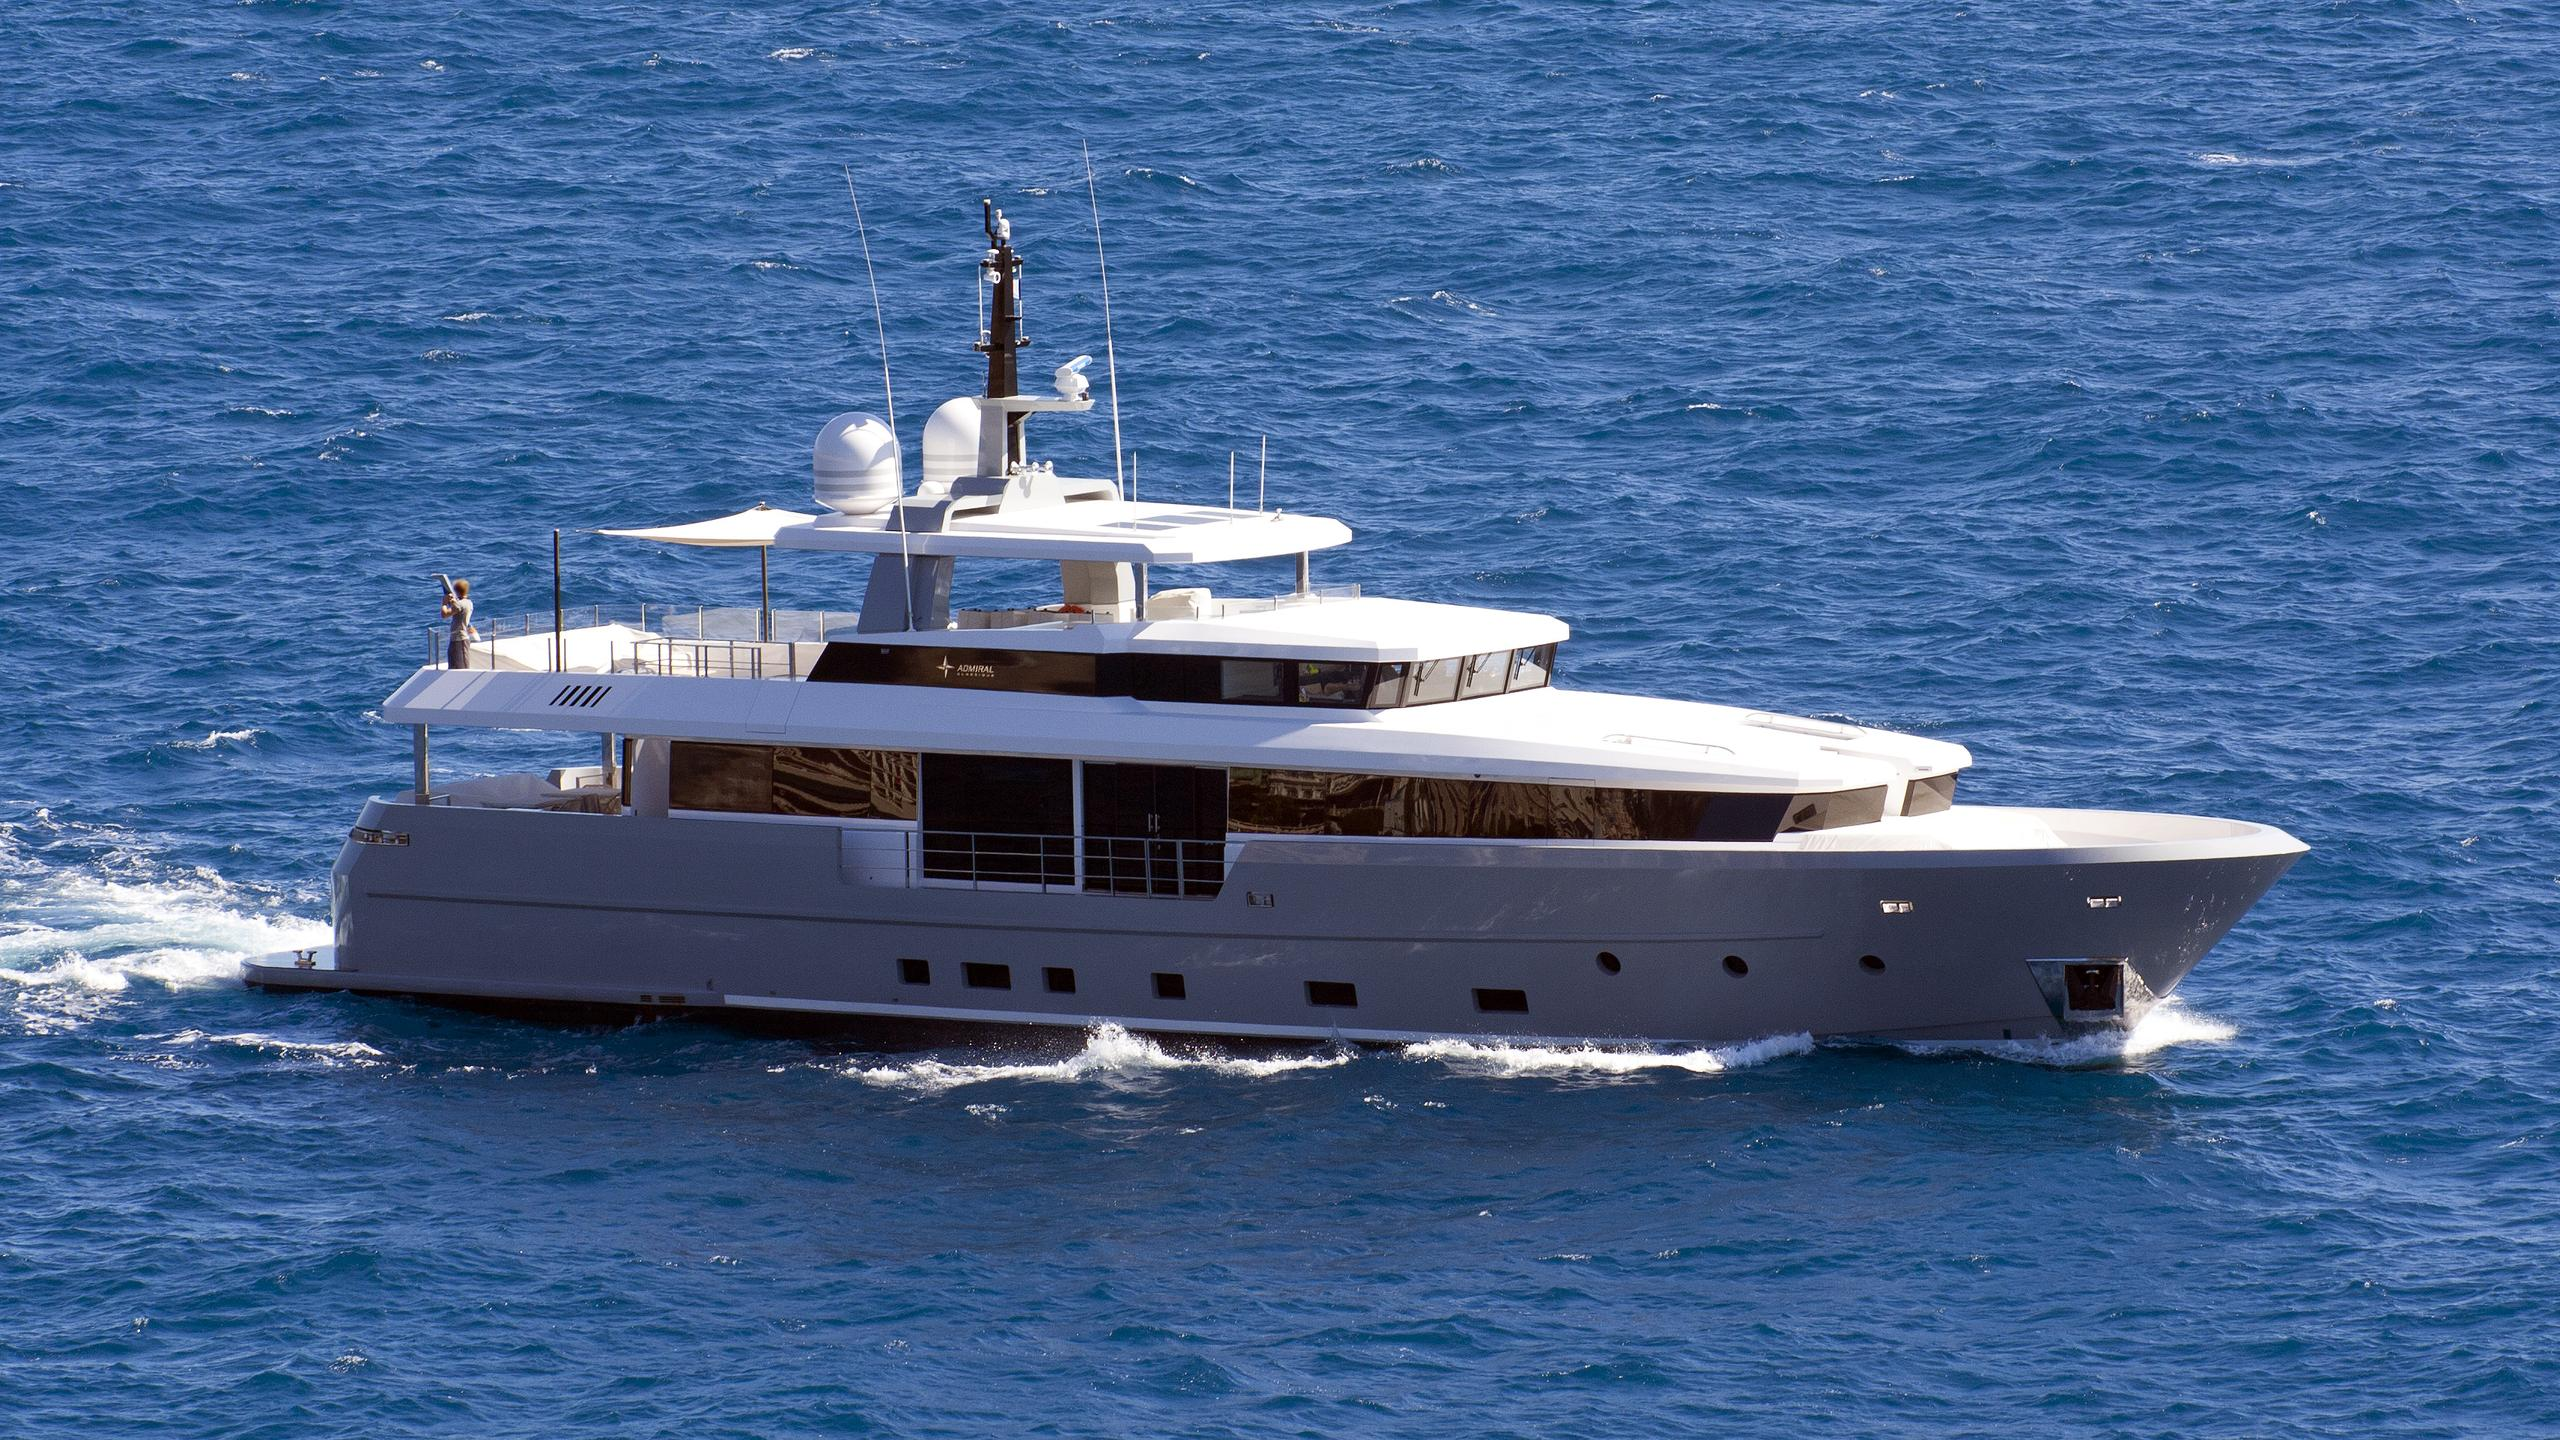 foam-motoryacht-admiral-italian-yacht-group-2014-35m-running